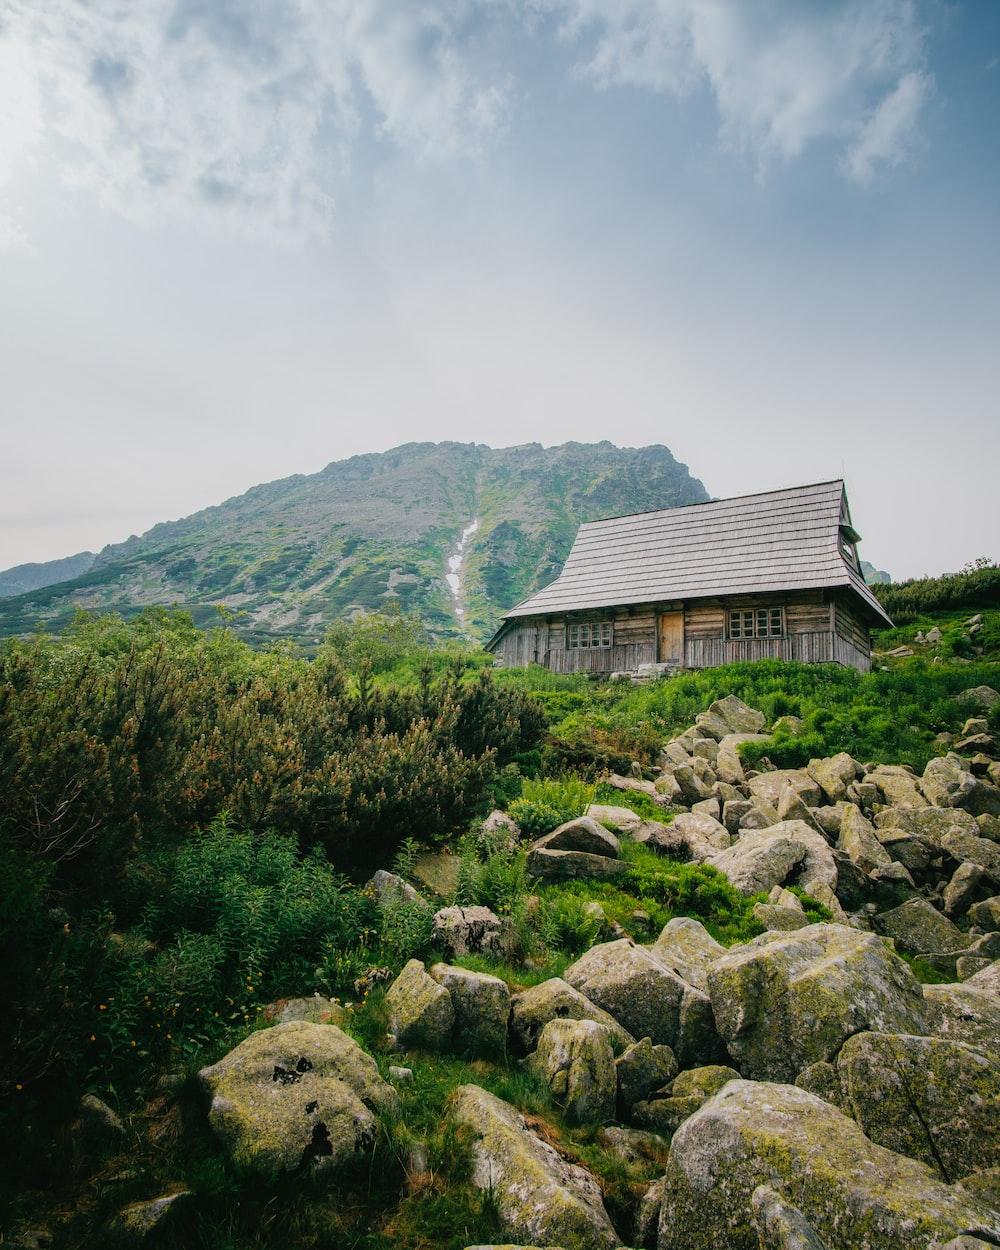 barn house beside mountain and rocks